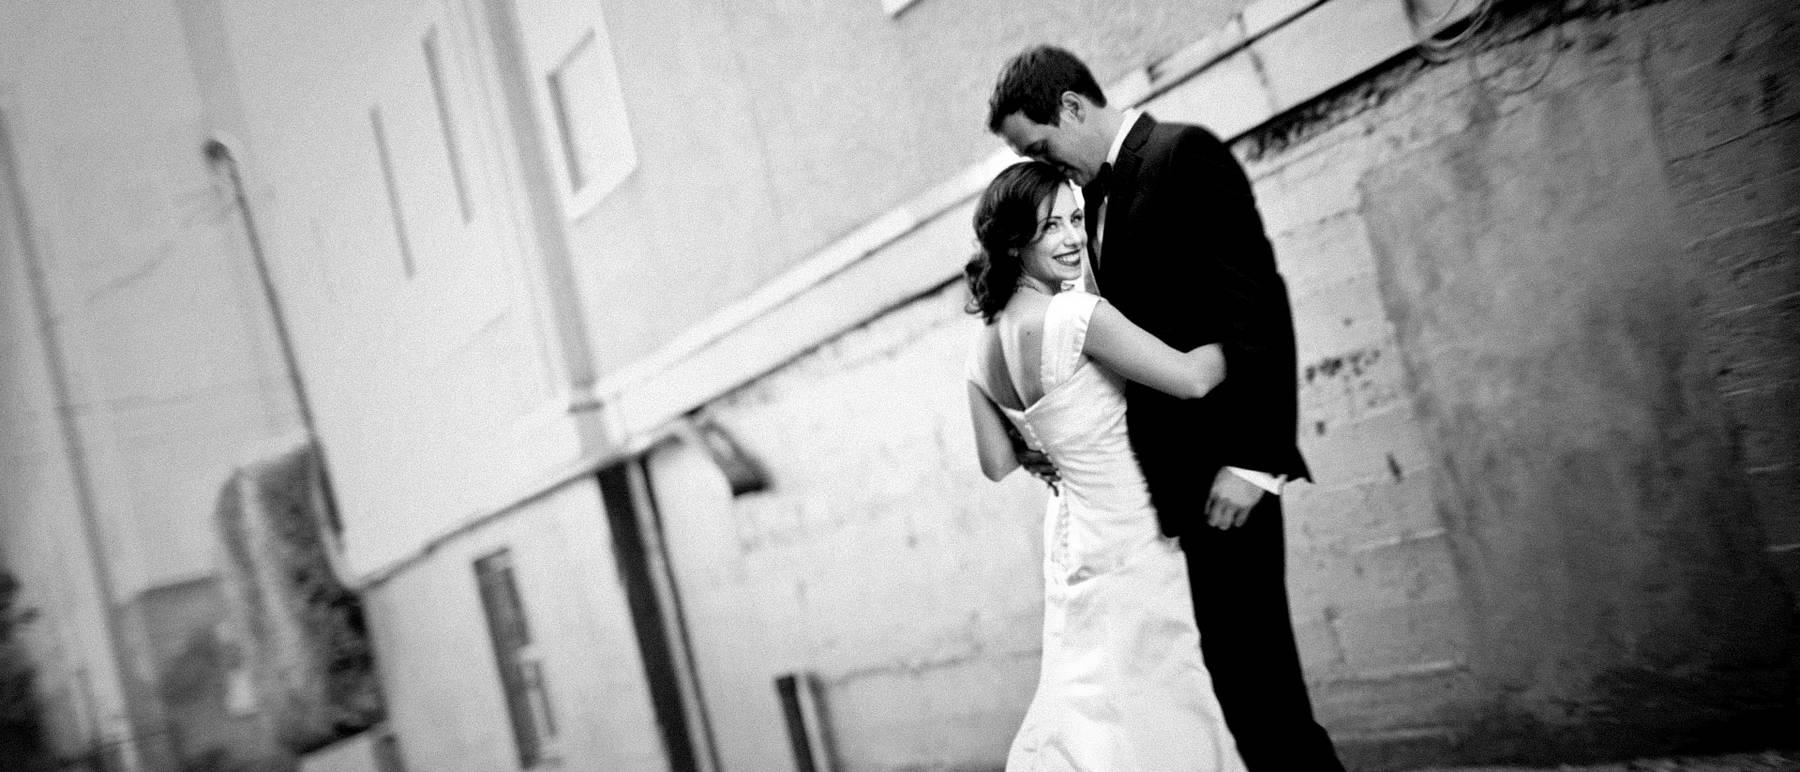 johnandjoseph-wedding-photographer-hz-slider-197